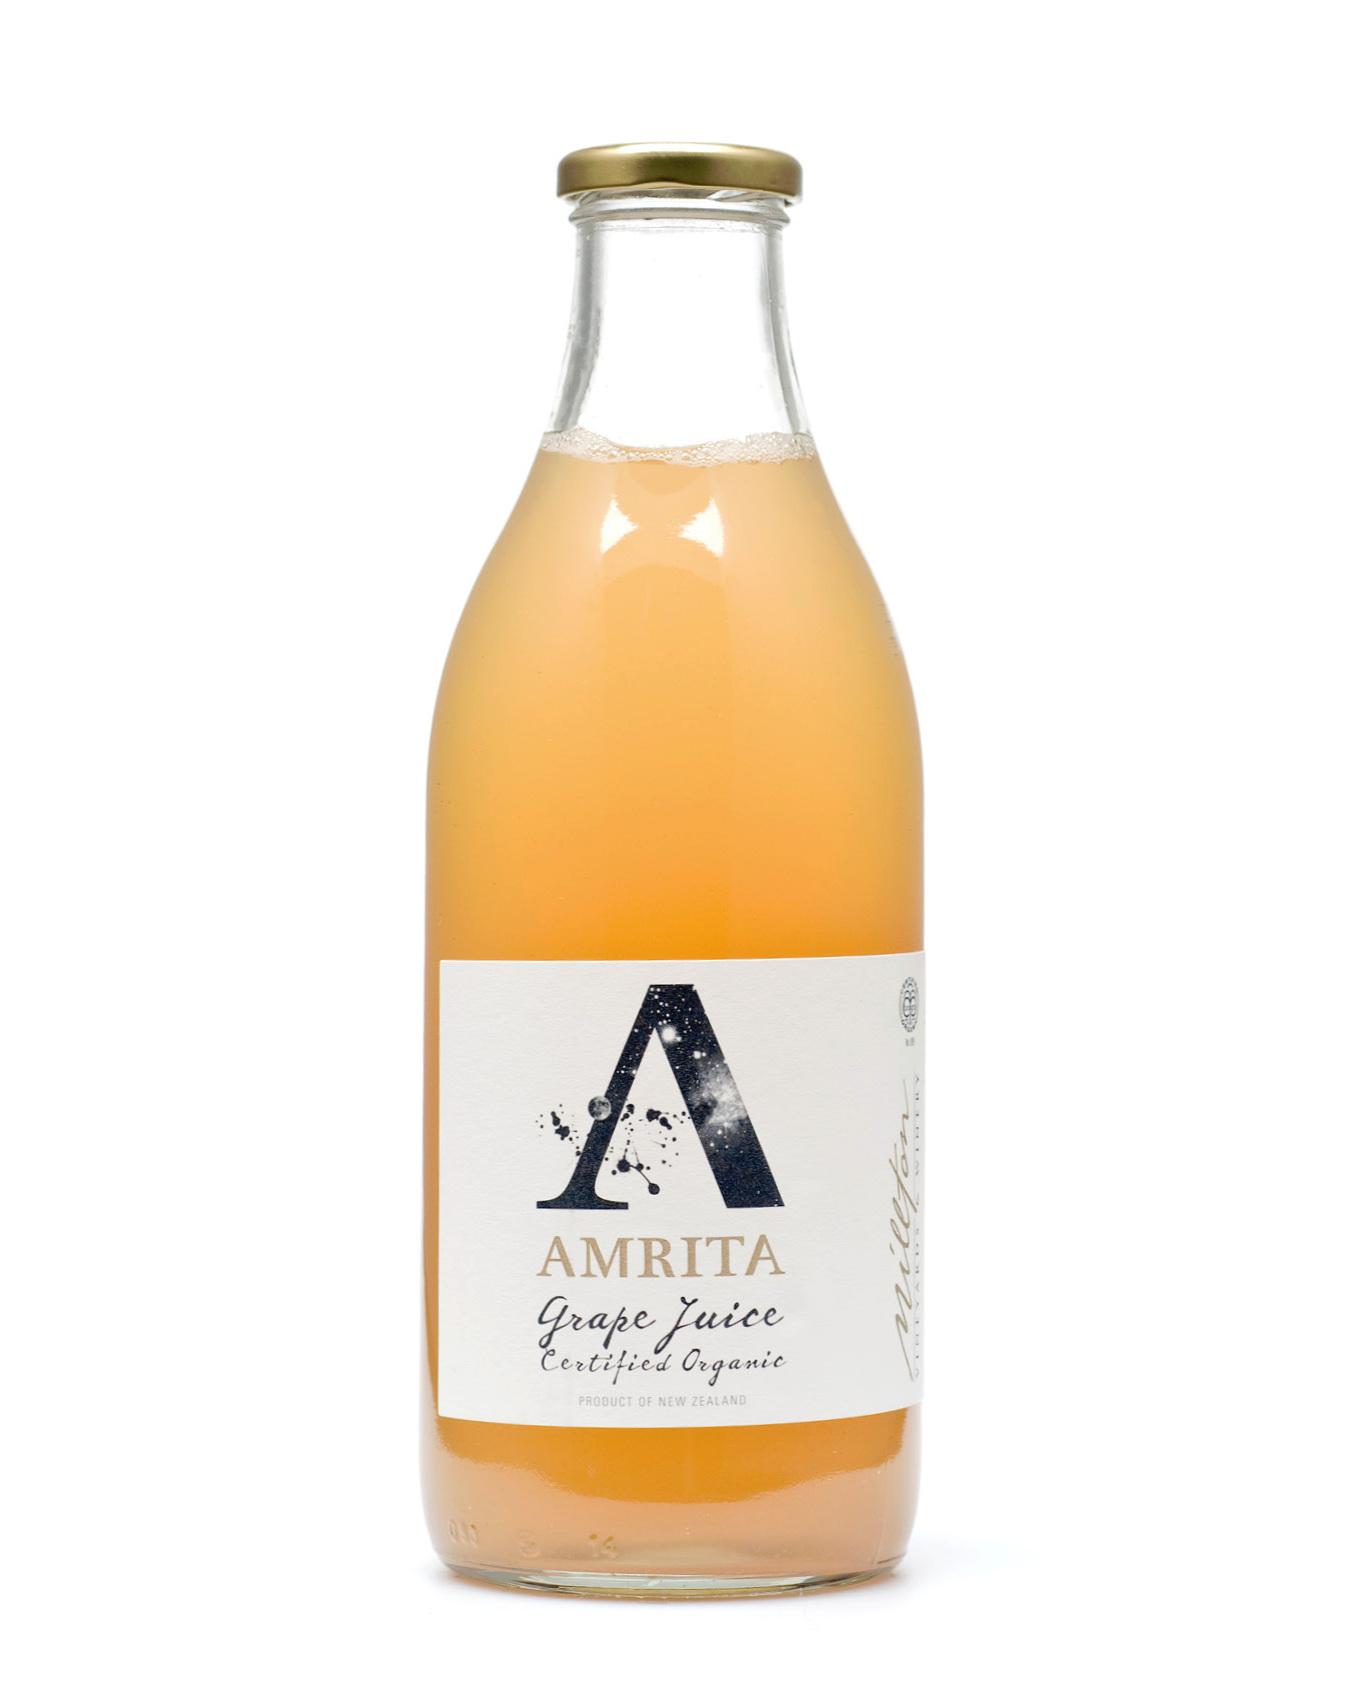 Amrita - am.ree.ta - Noun - Hindu Mythology1. Nectar of the Gods.2. The beverage of immortality.